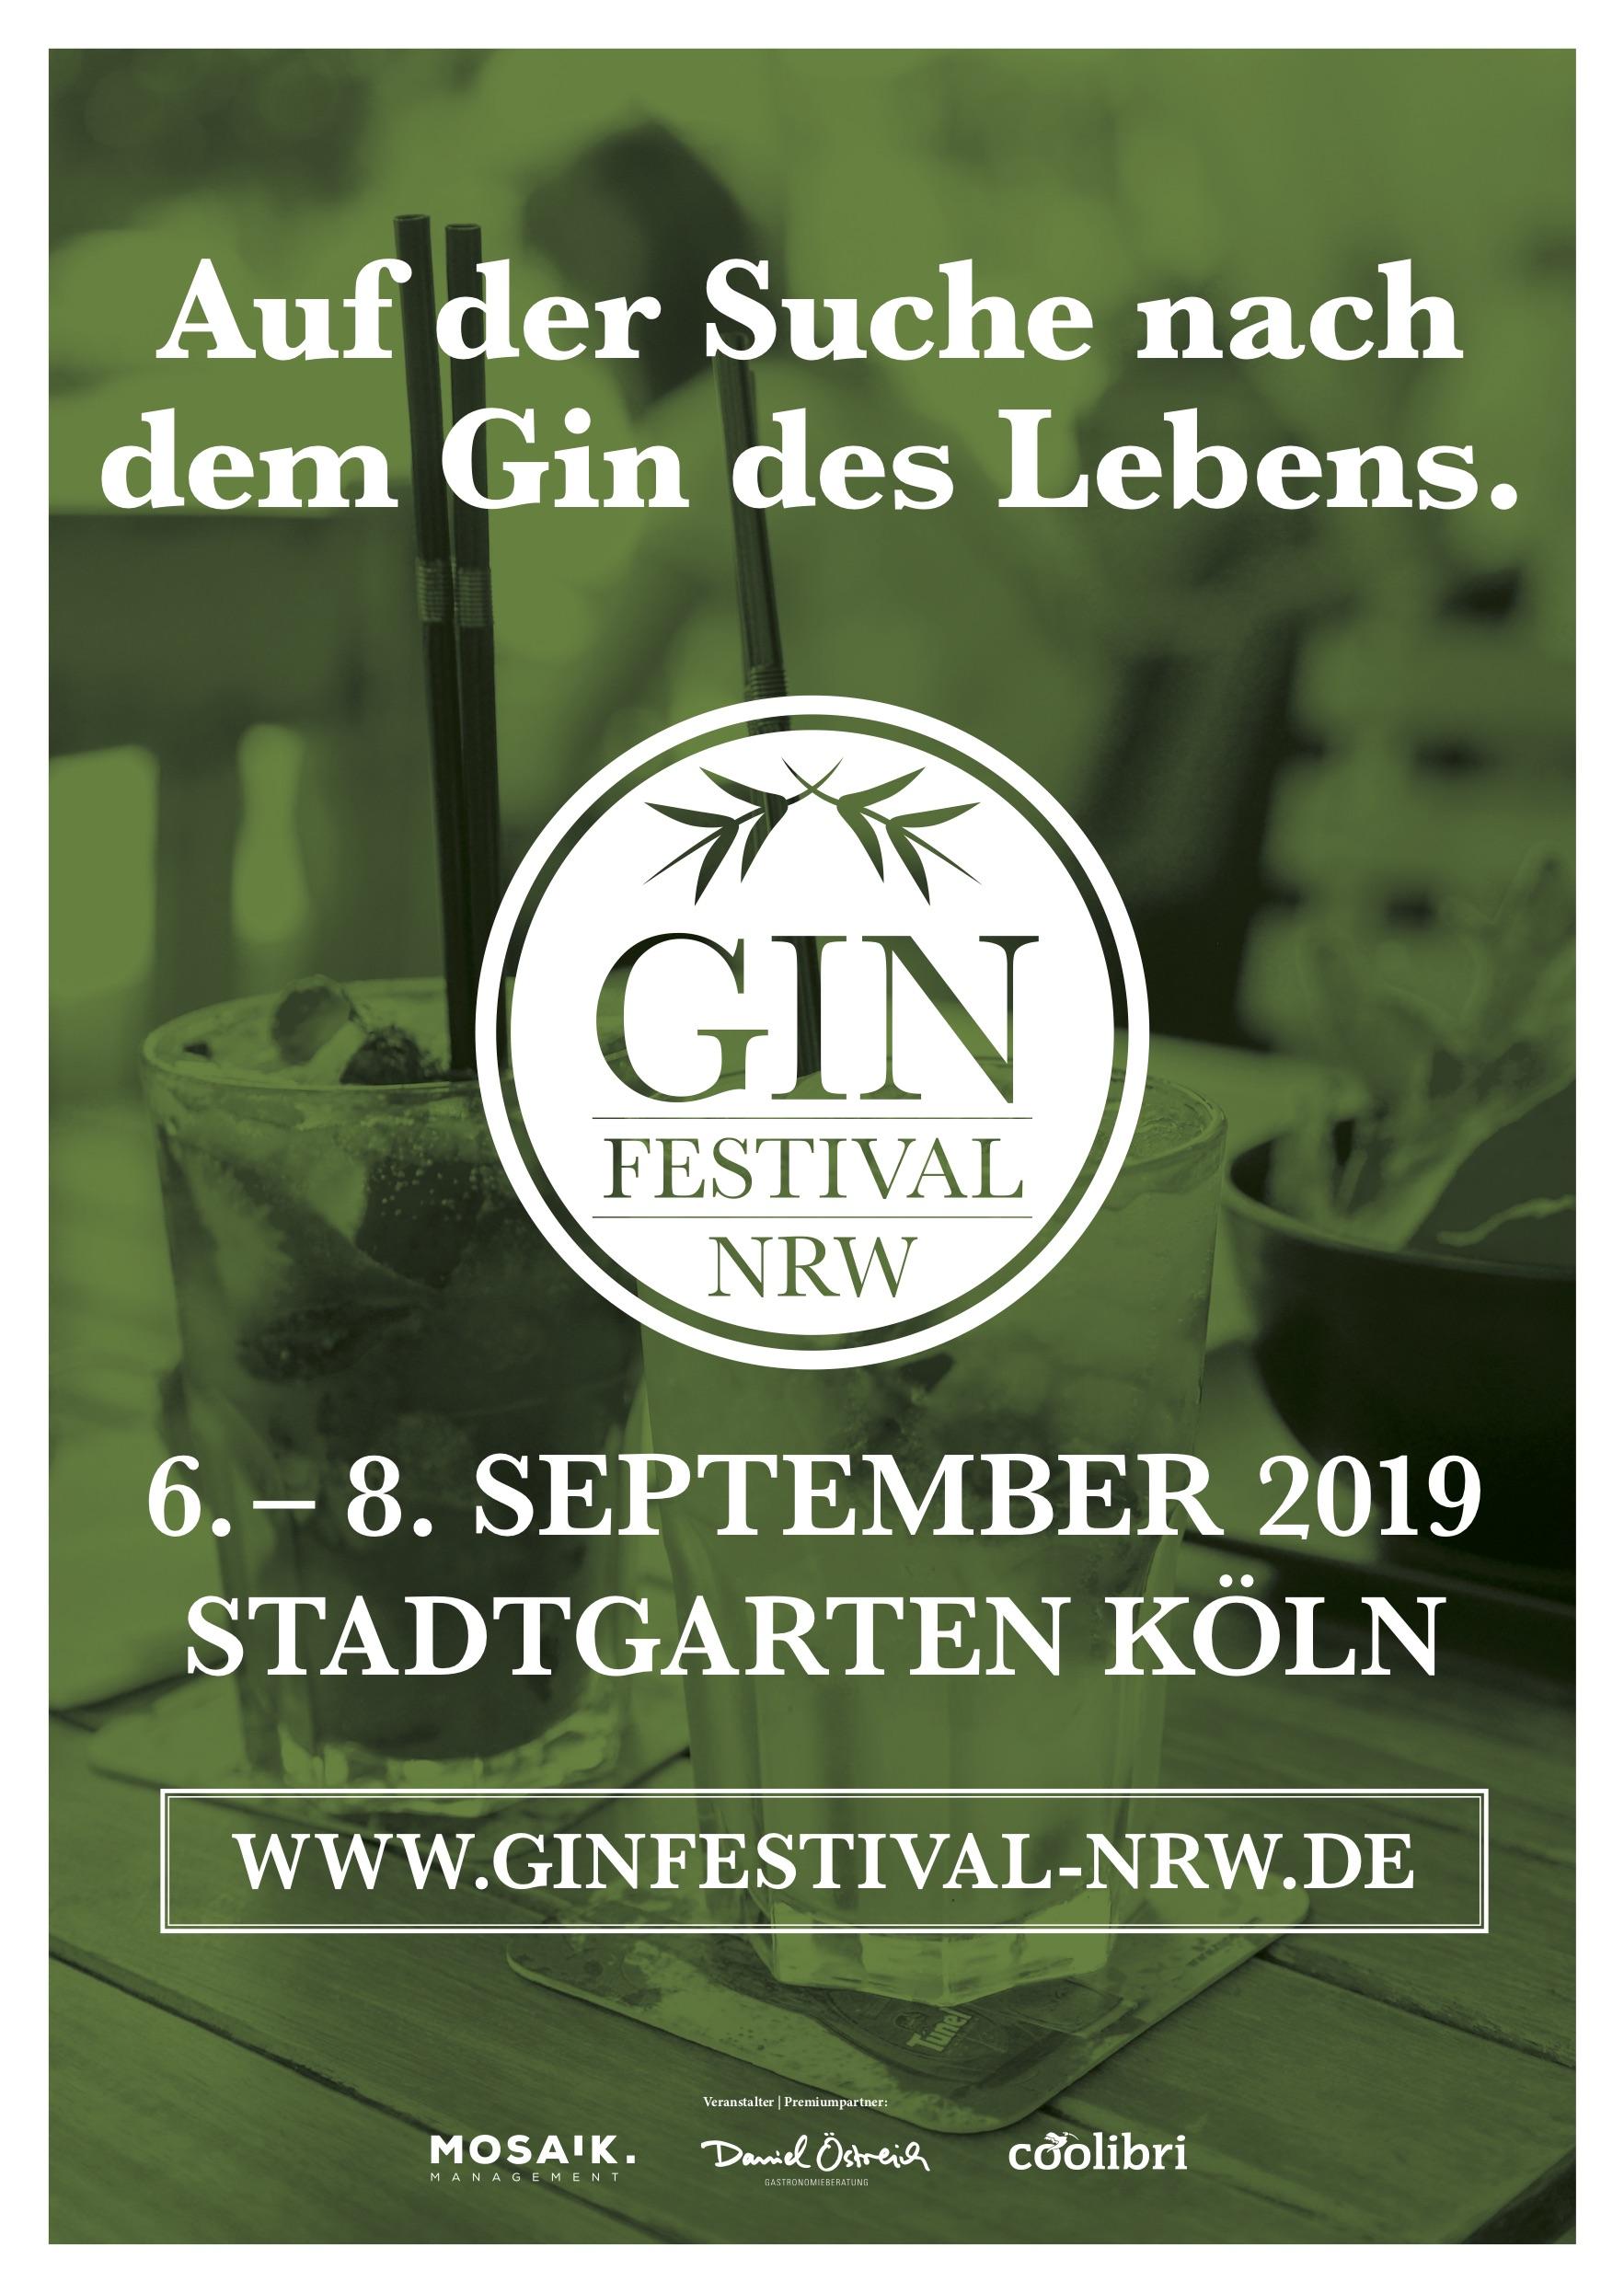 festivals nrw 2019